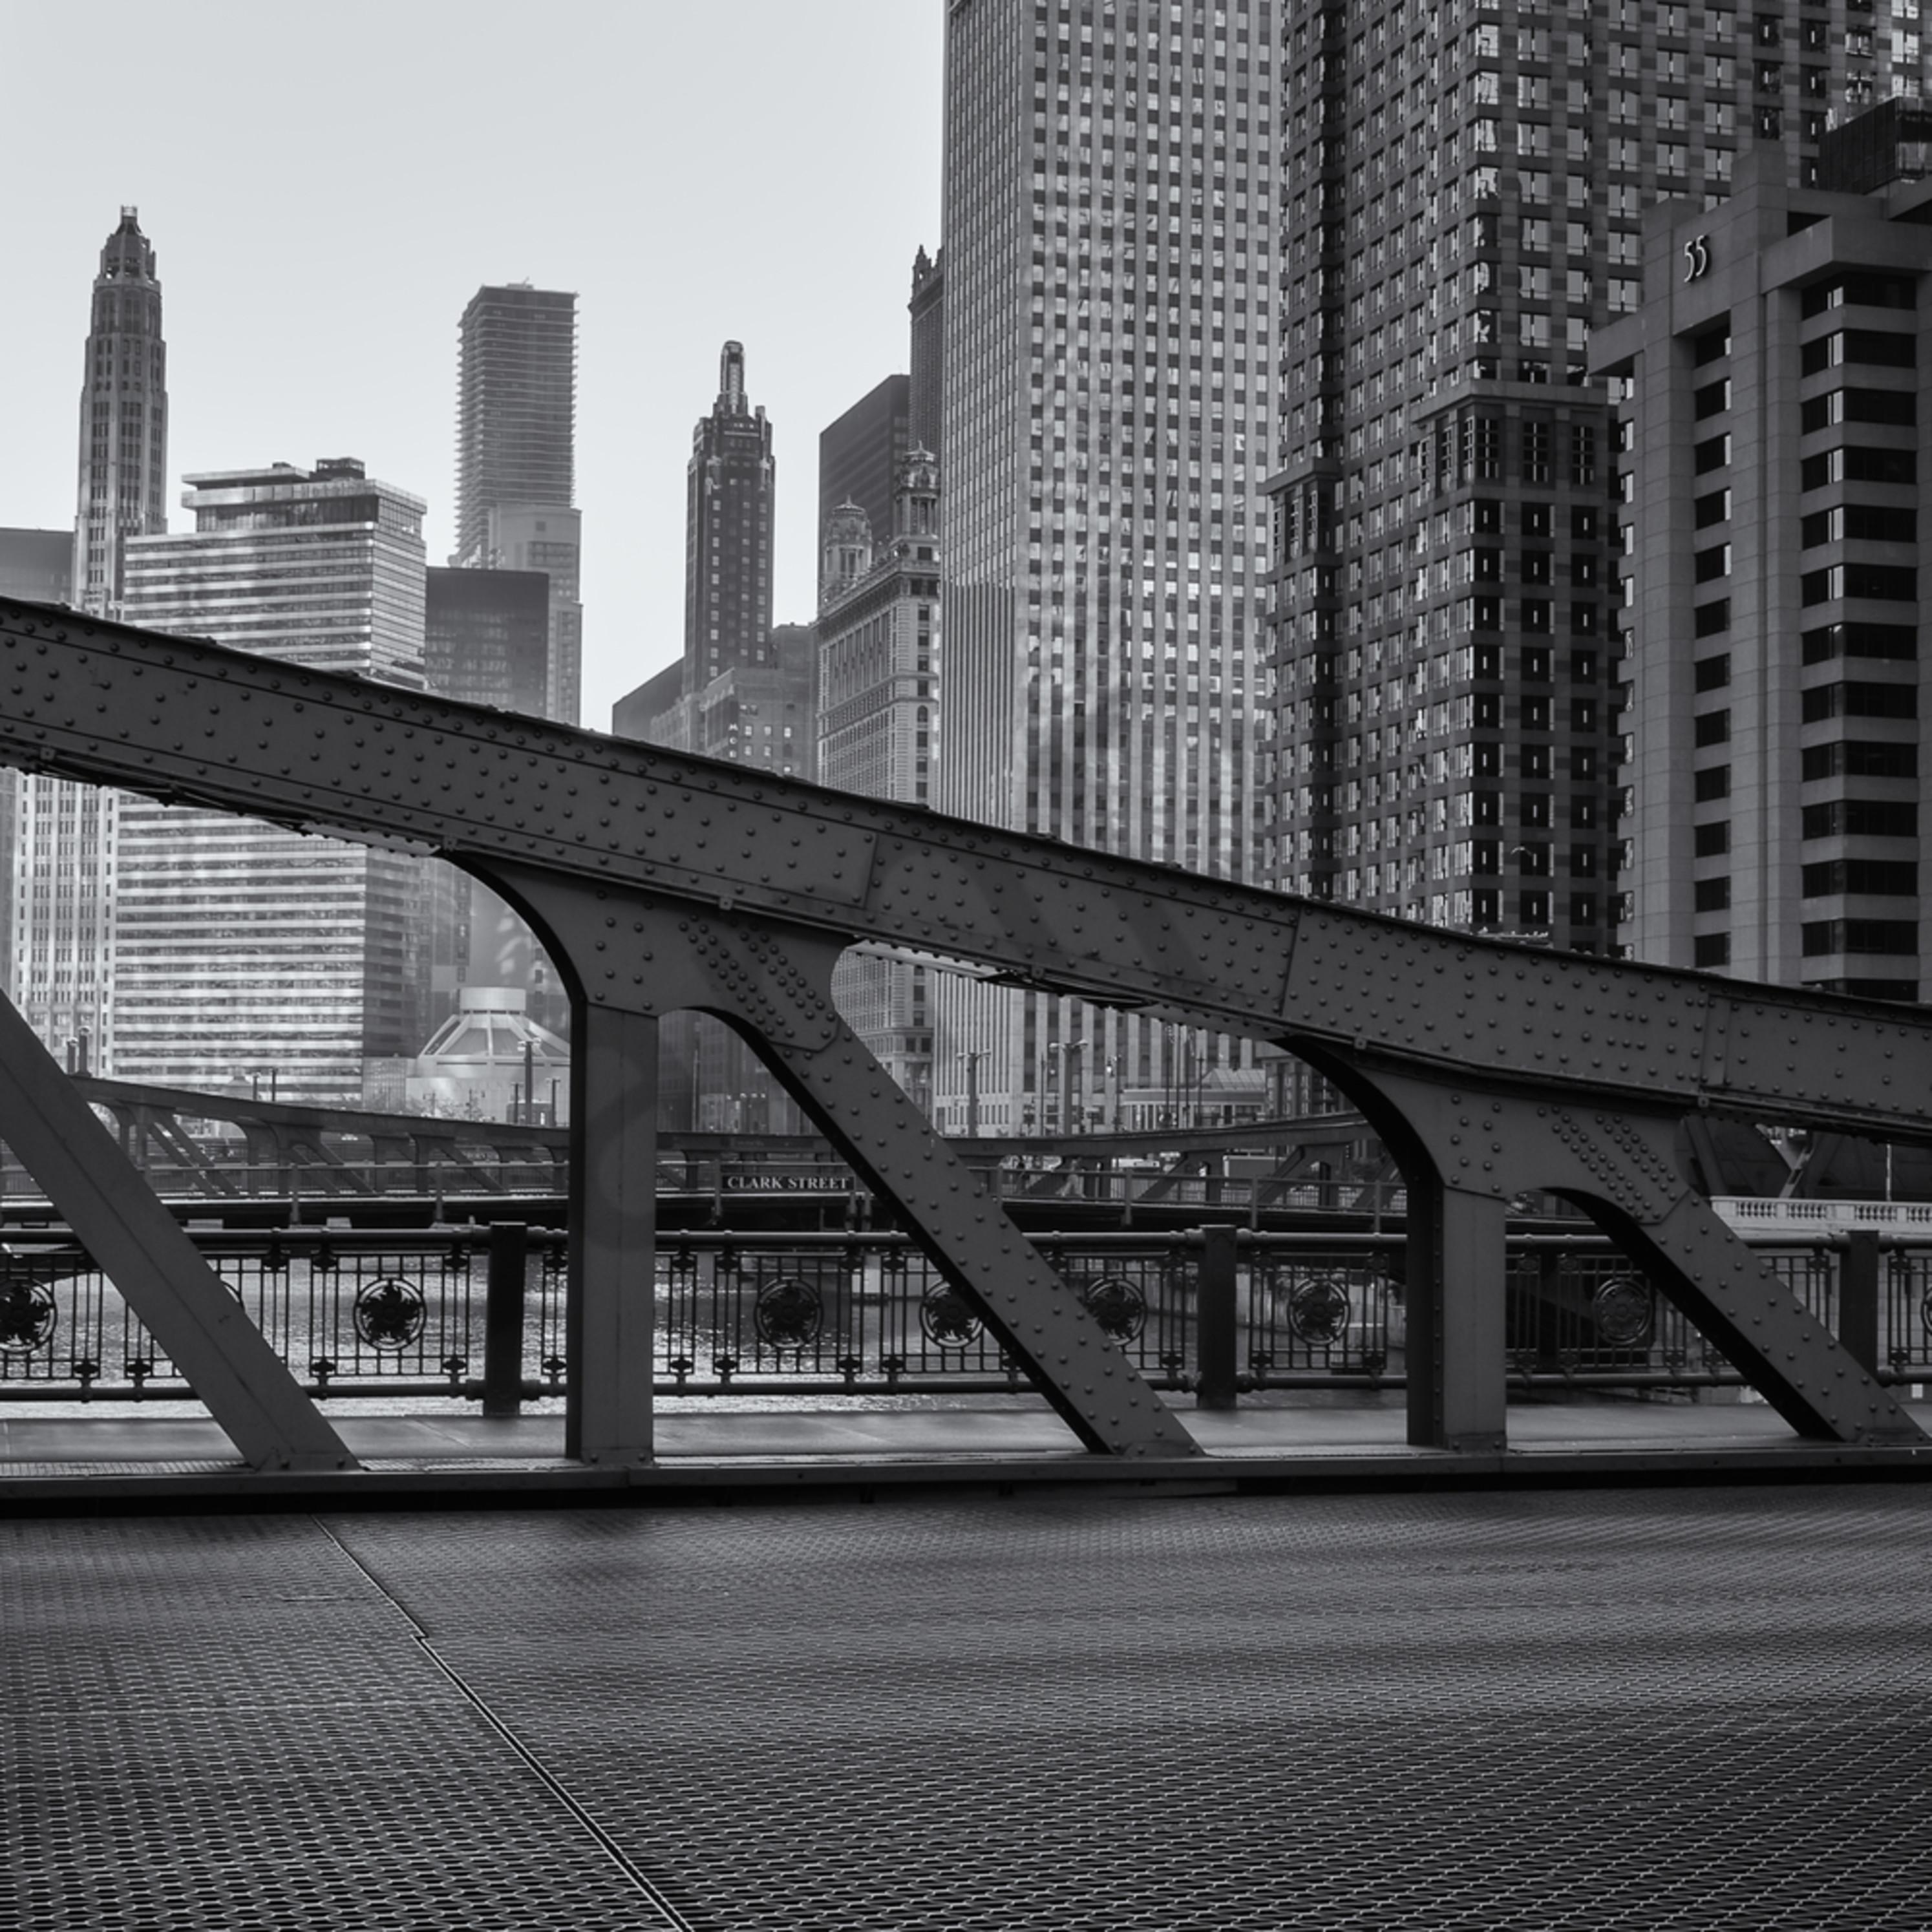 Bridge   chicago qfrmrw